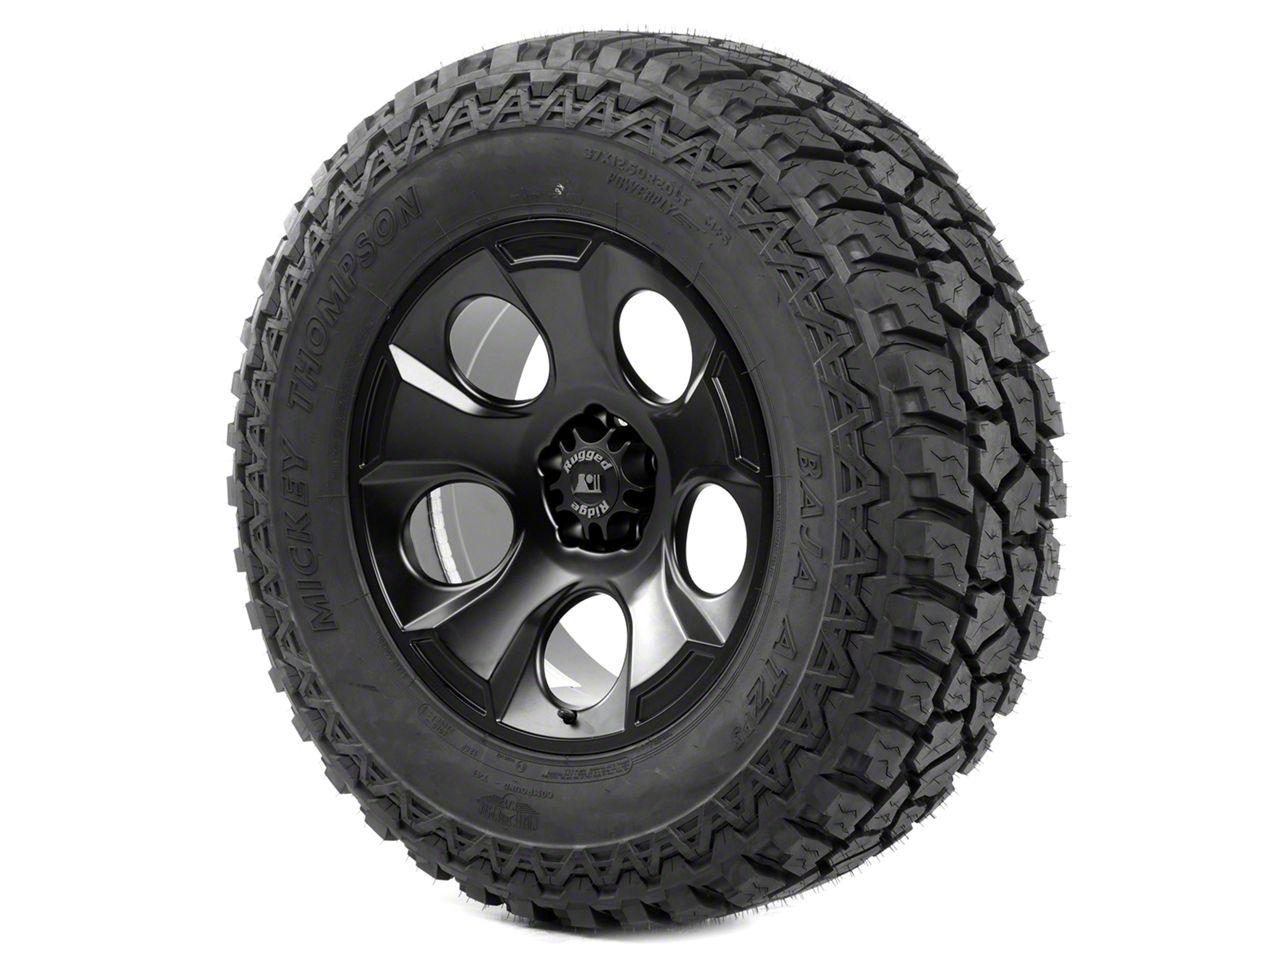 Rugged Ridge Drakon Wheel 20x9 Black Satin and Mickey Thompson ATZ P3 37x12.50x20 Tire Kit (07-12 Jeep Wrangler JK)